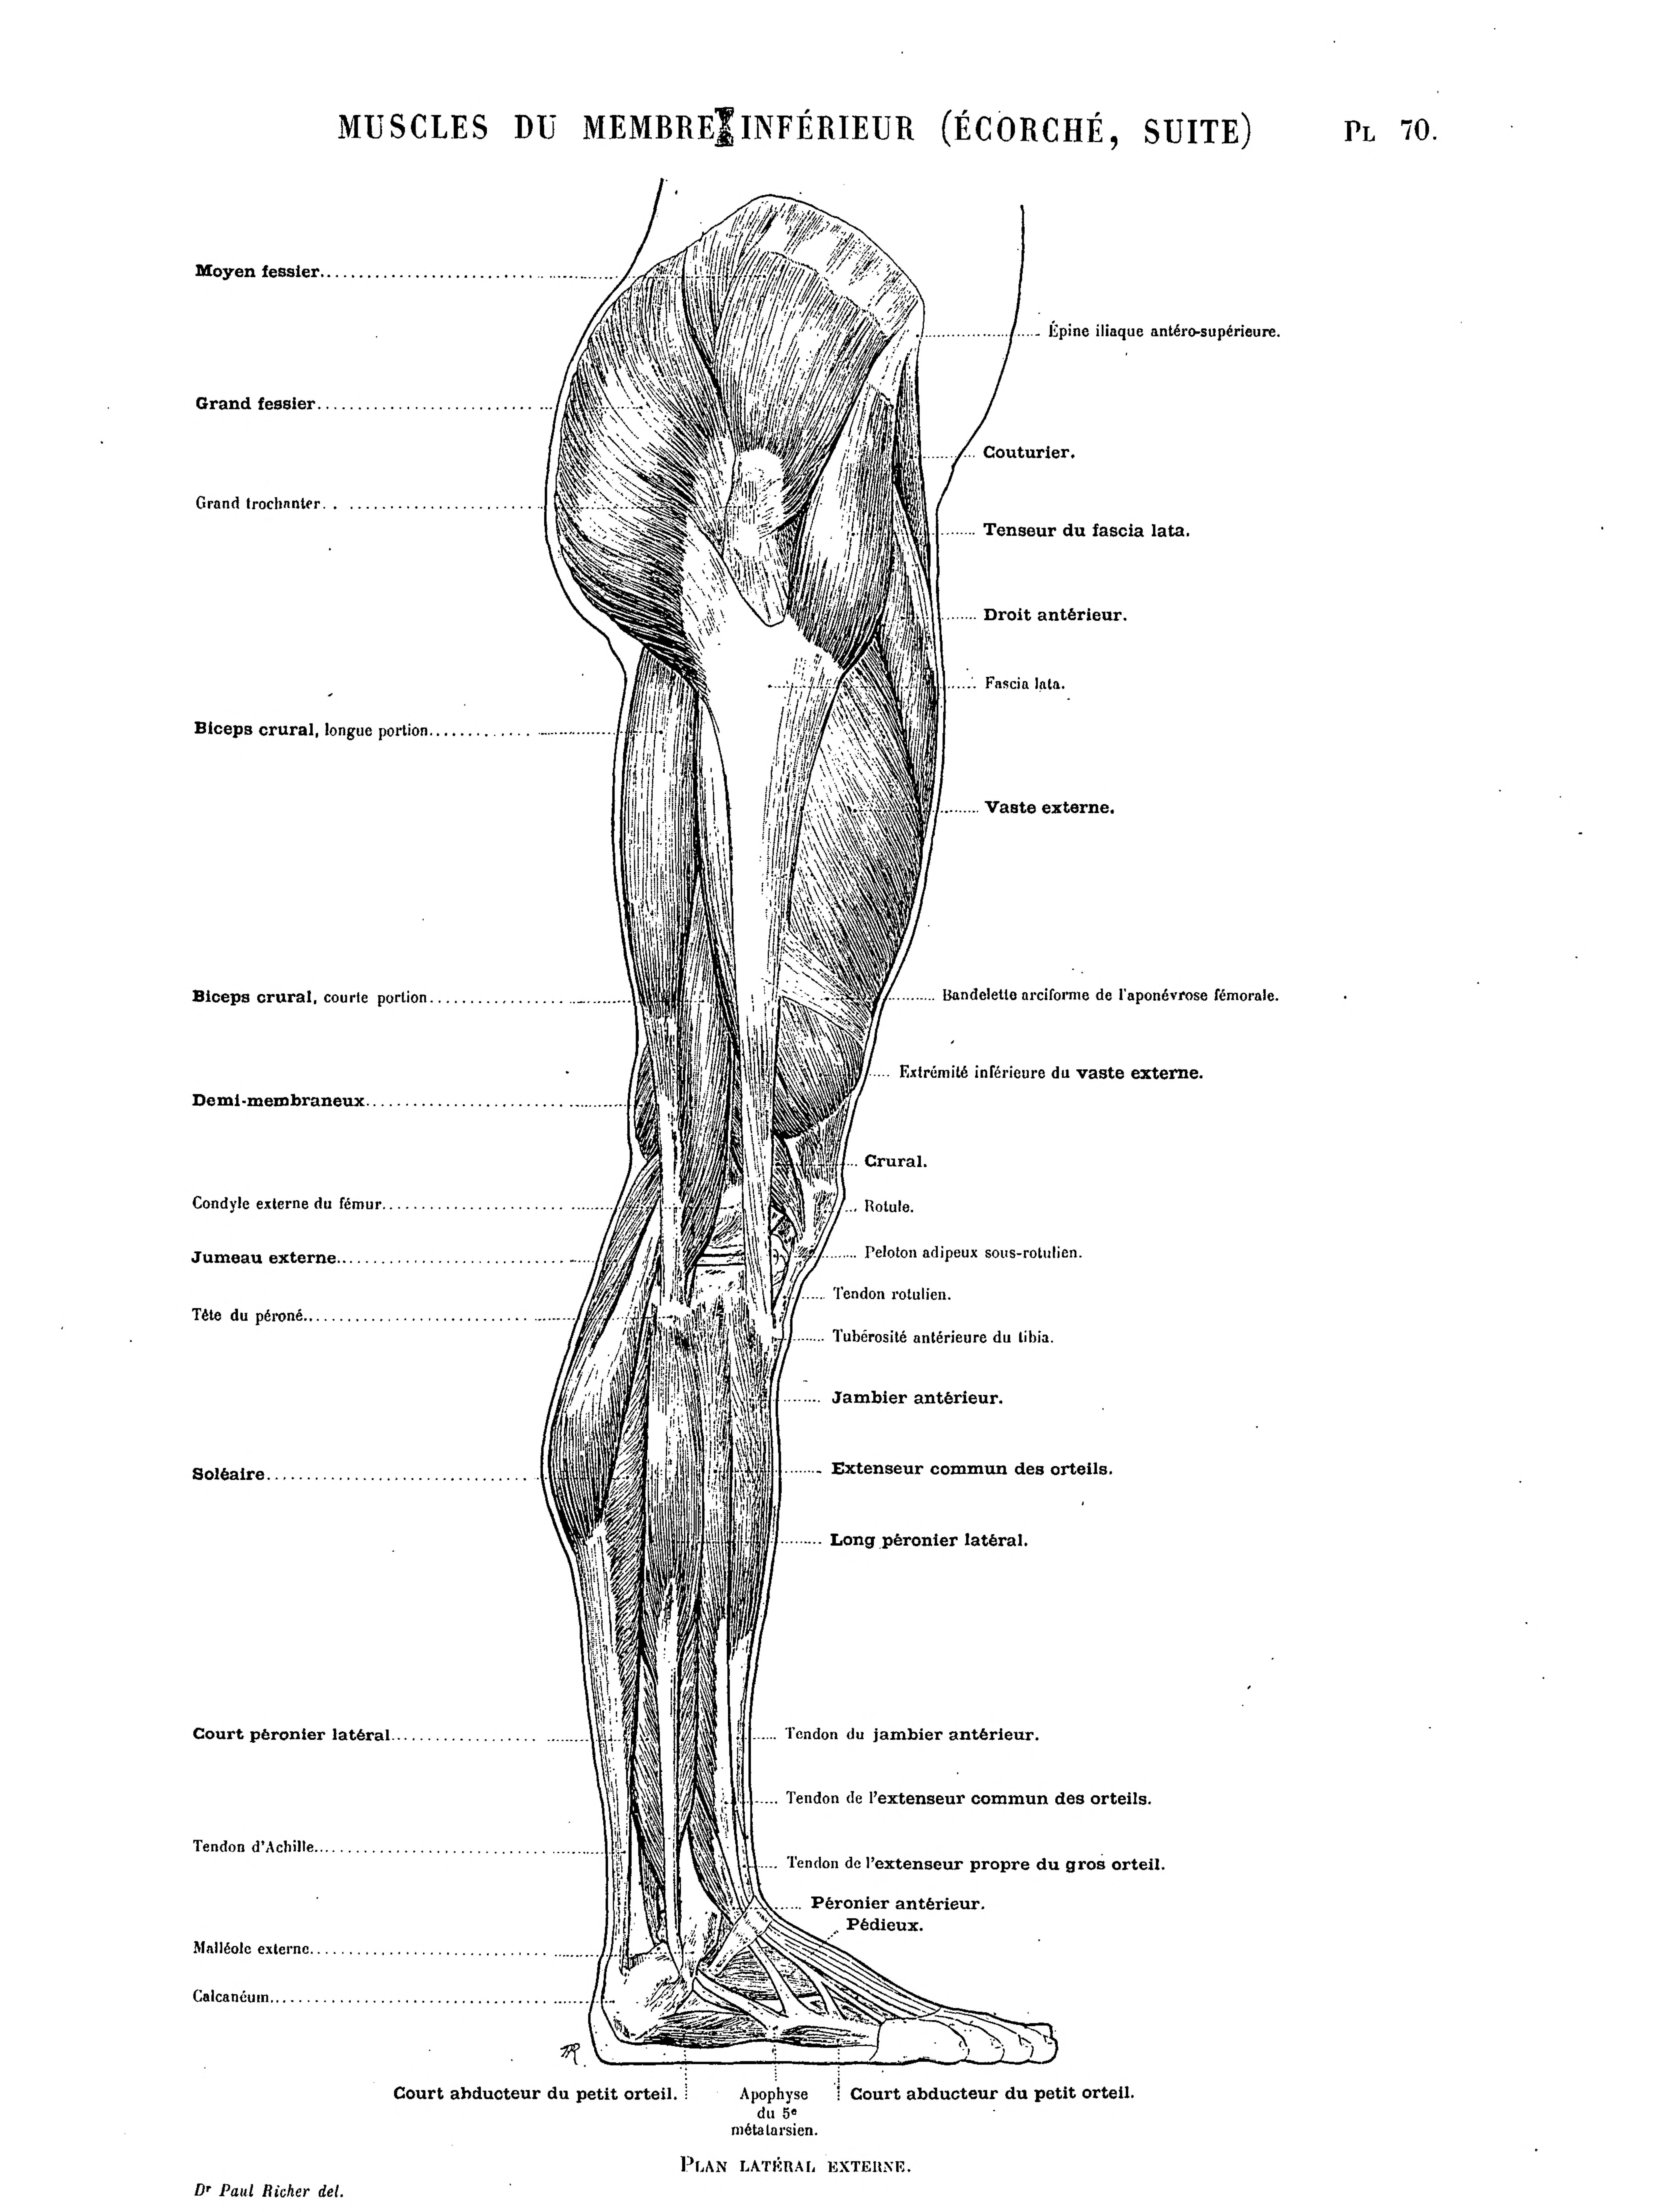 Erfreut Körperbild Muskeln Fotos - Anatomie Ideen - finotti.info